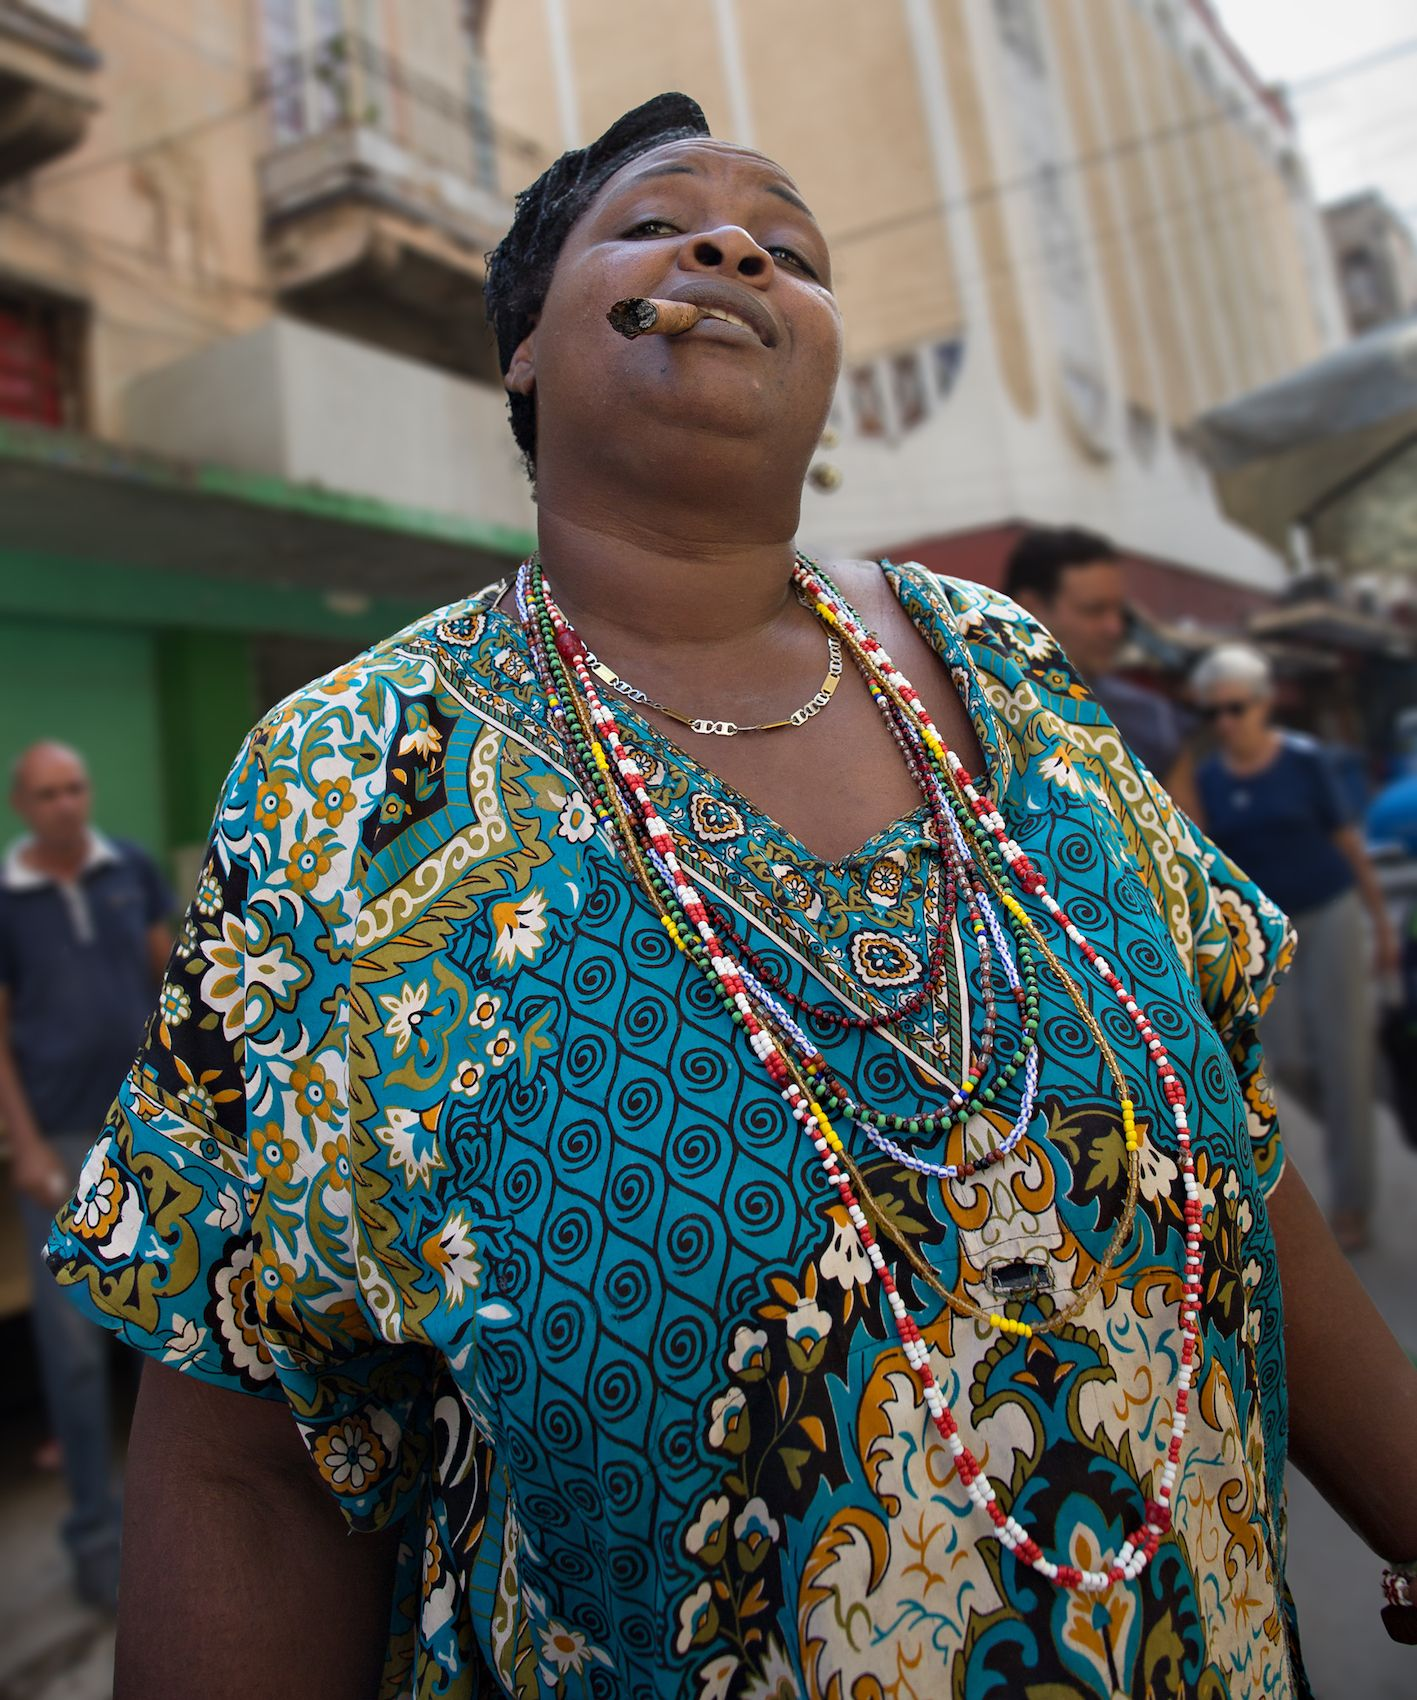 1586-Fruit-Vendor,-Downtown-Havana-copy.jpg